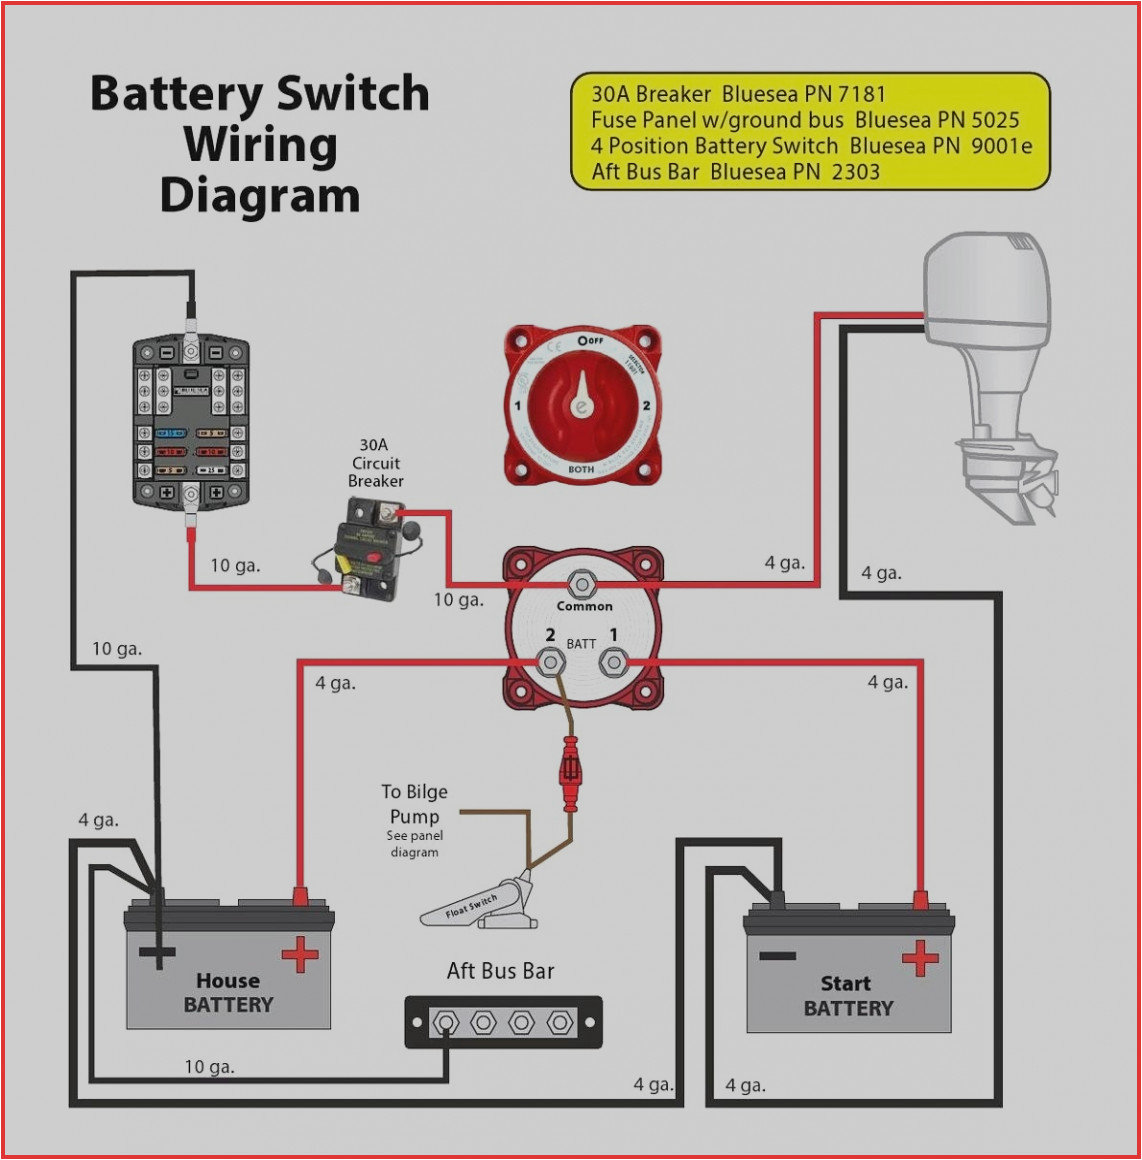 24 Volt Battery Wiring Diagram 4 Battery Wiring Diagram Wiring Diagram Blog